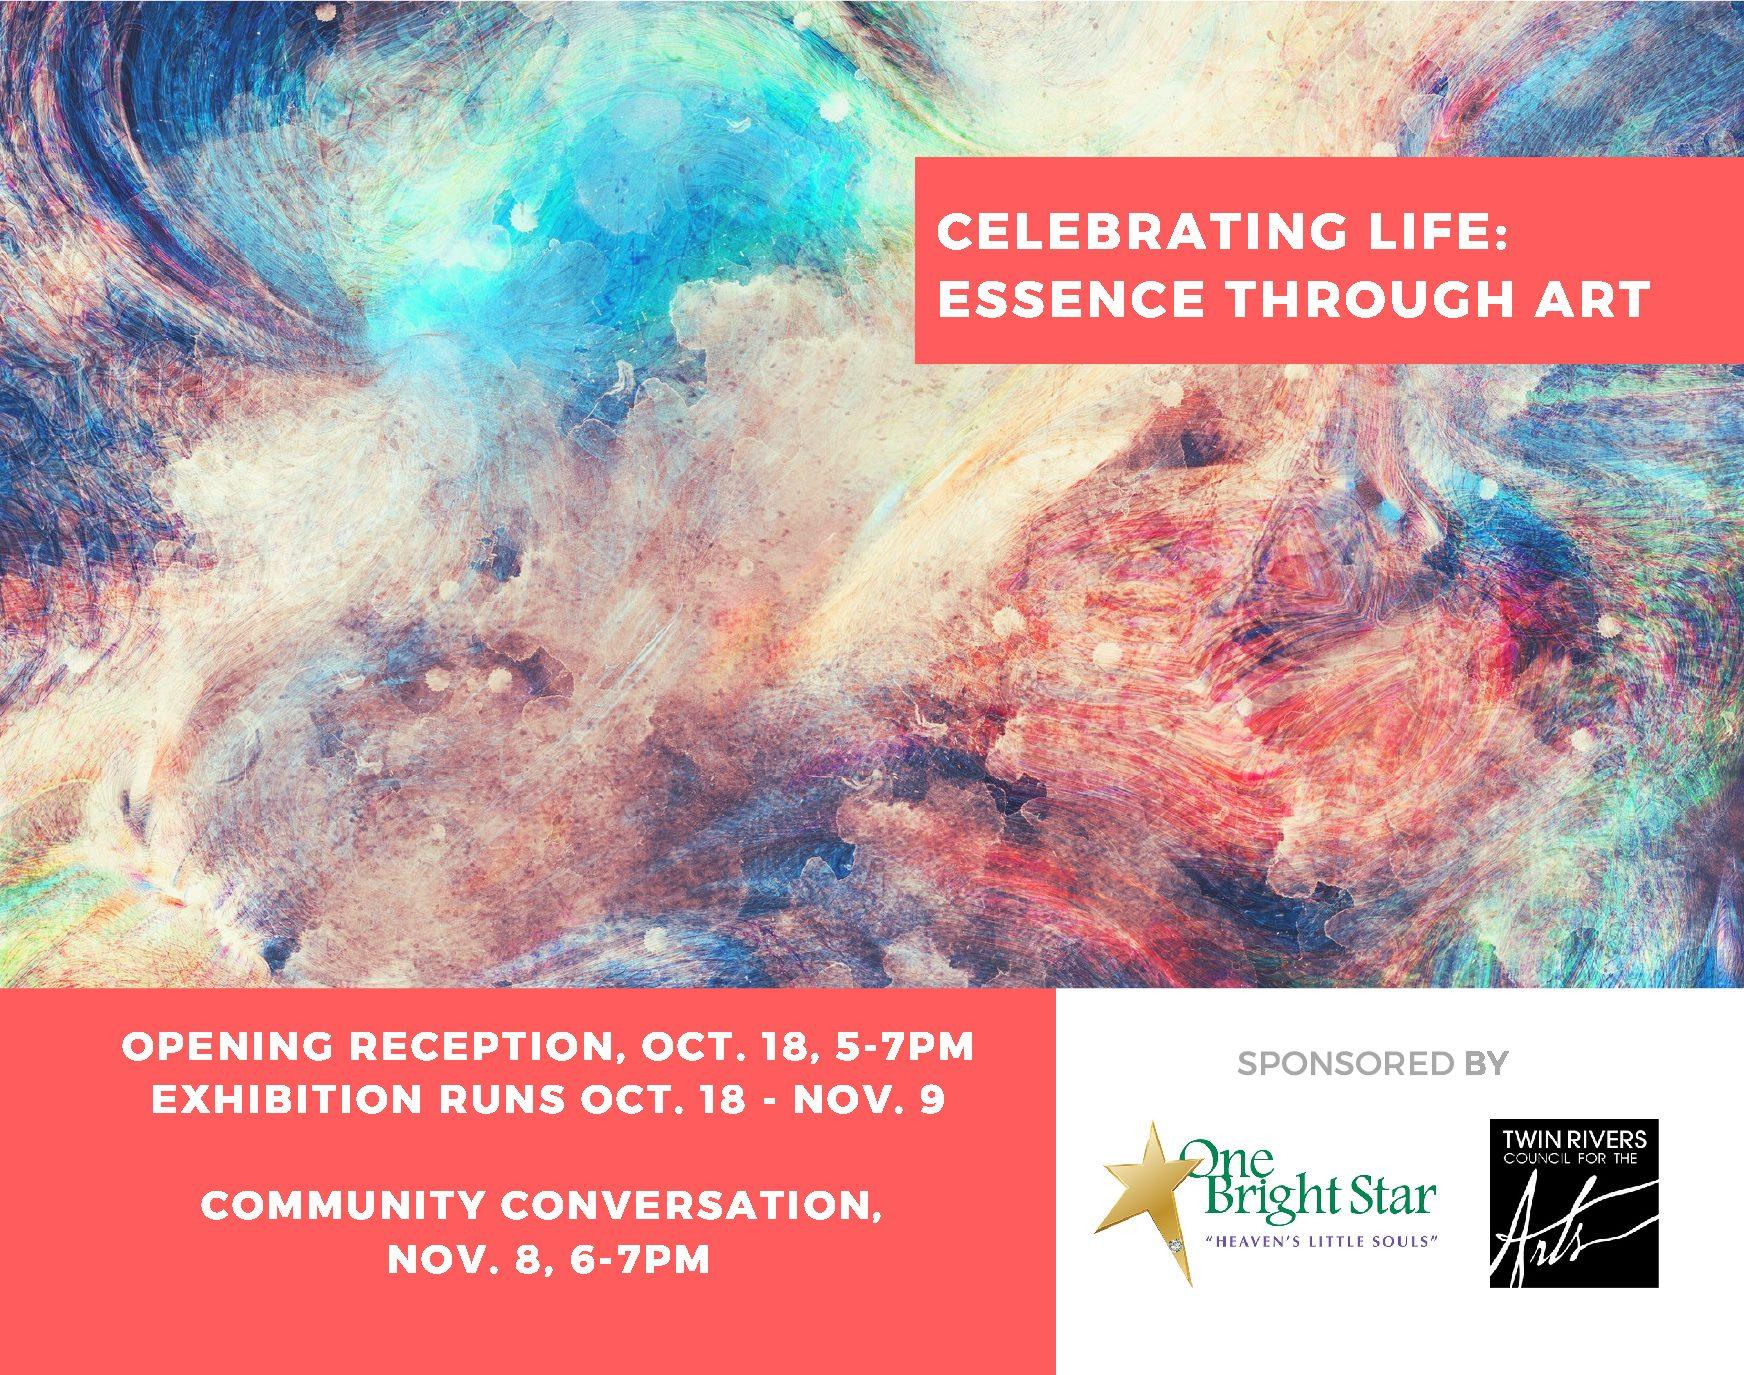 Celebrating Life: Essence Through Art